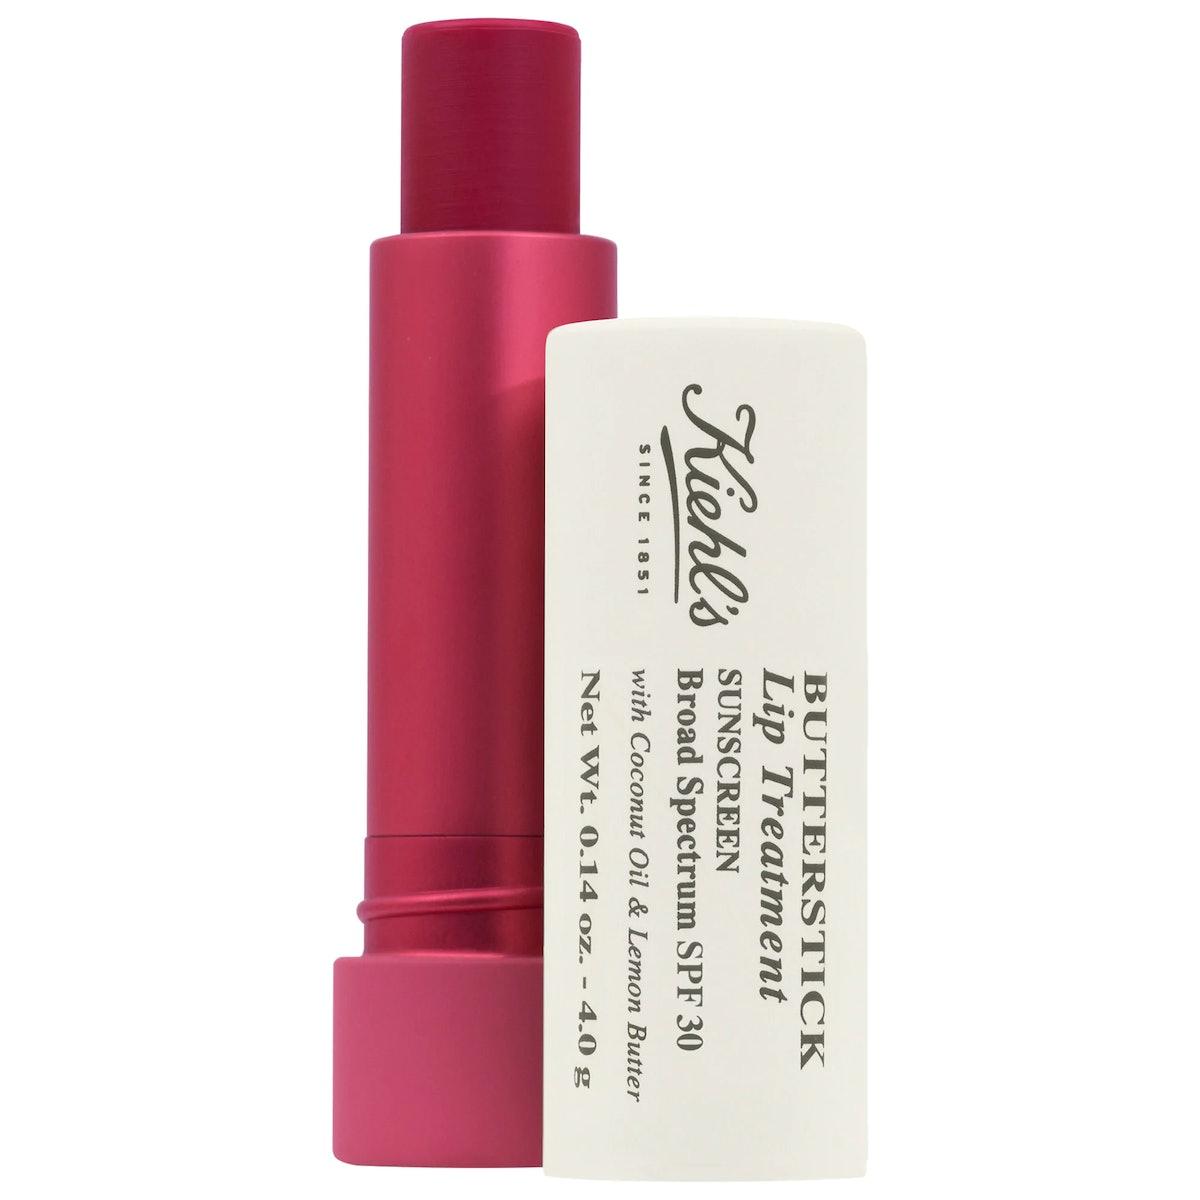 Kiehl's Butterstick Lip Treatment SPF 30